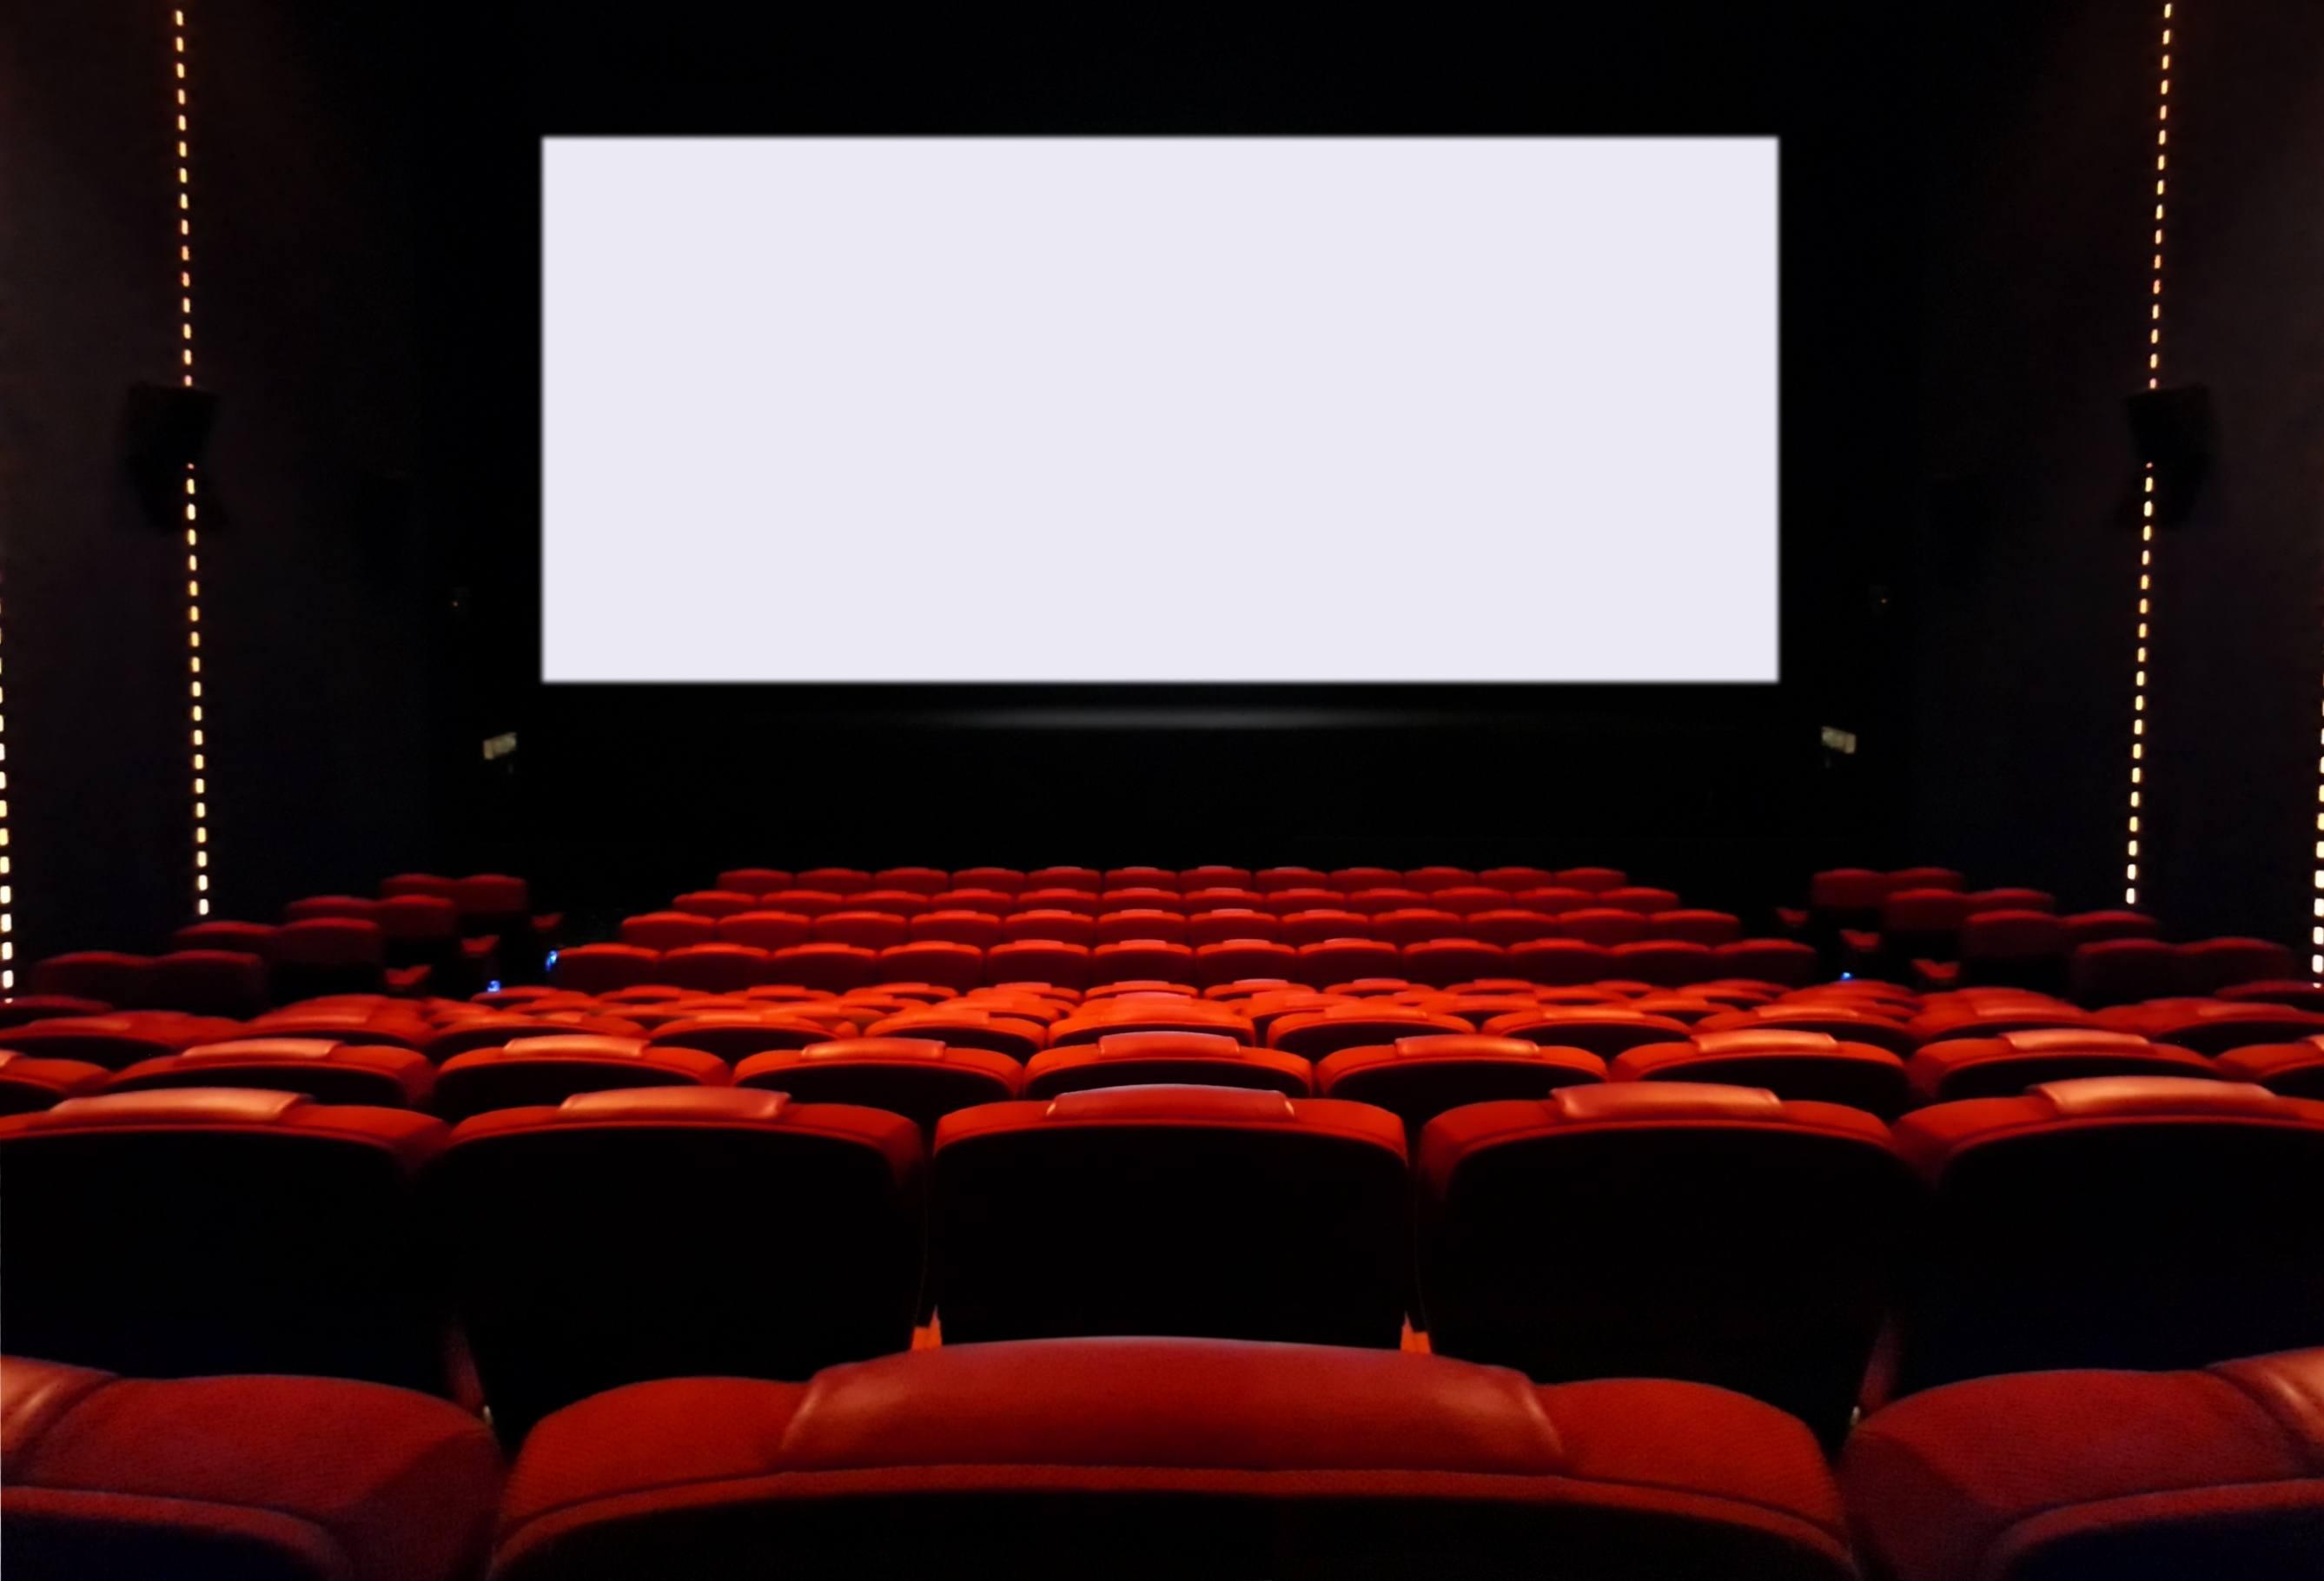 Empty cinema seats with blank white screen